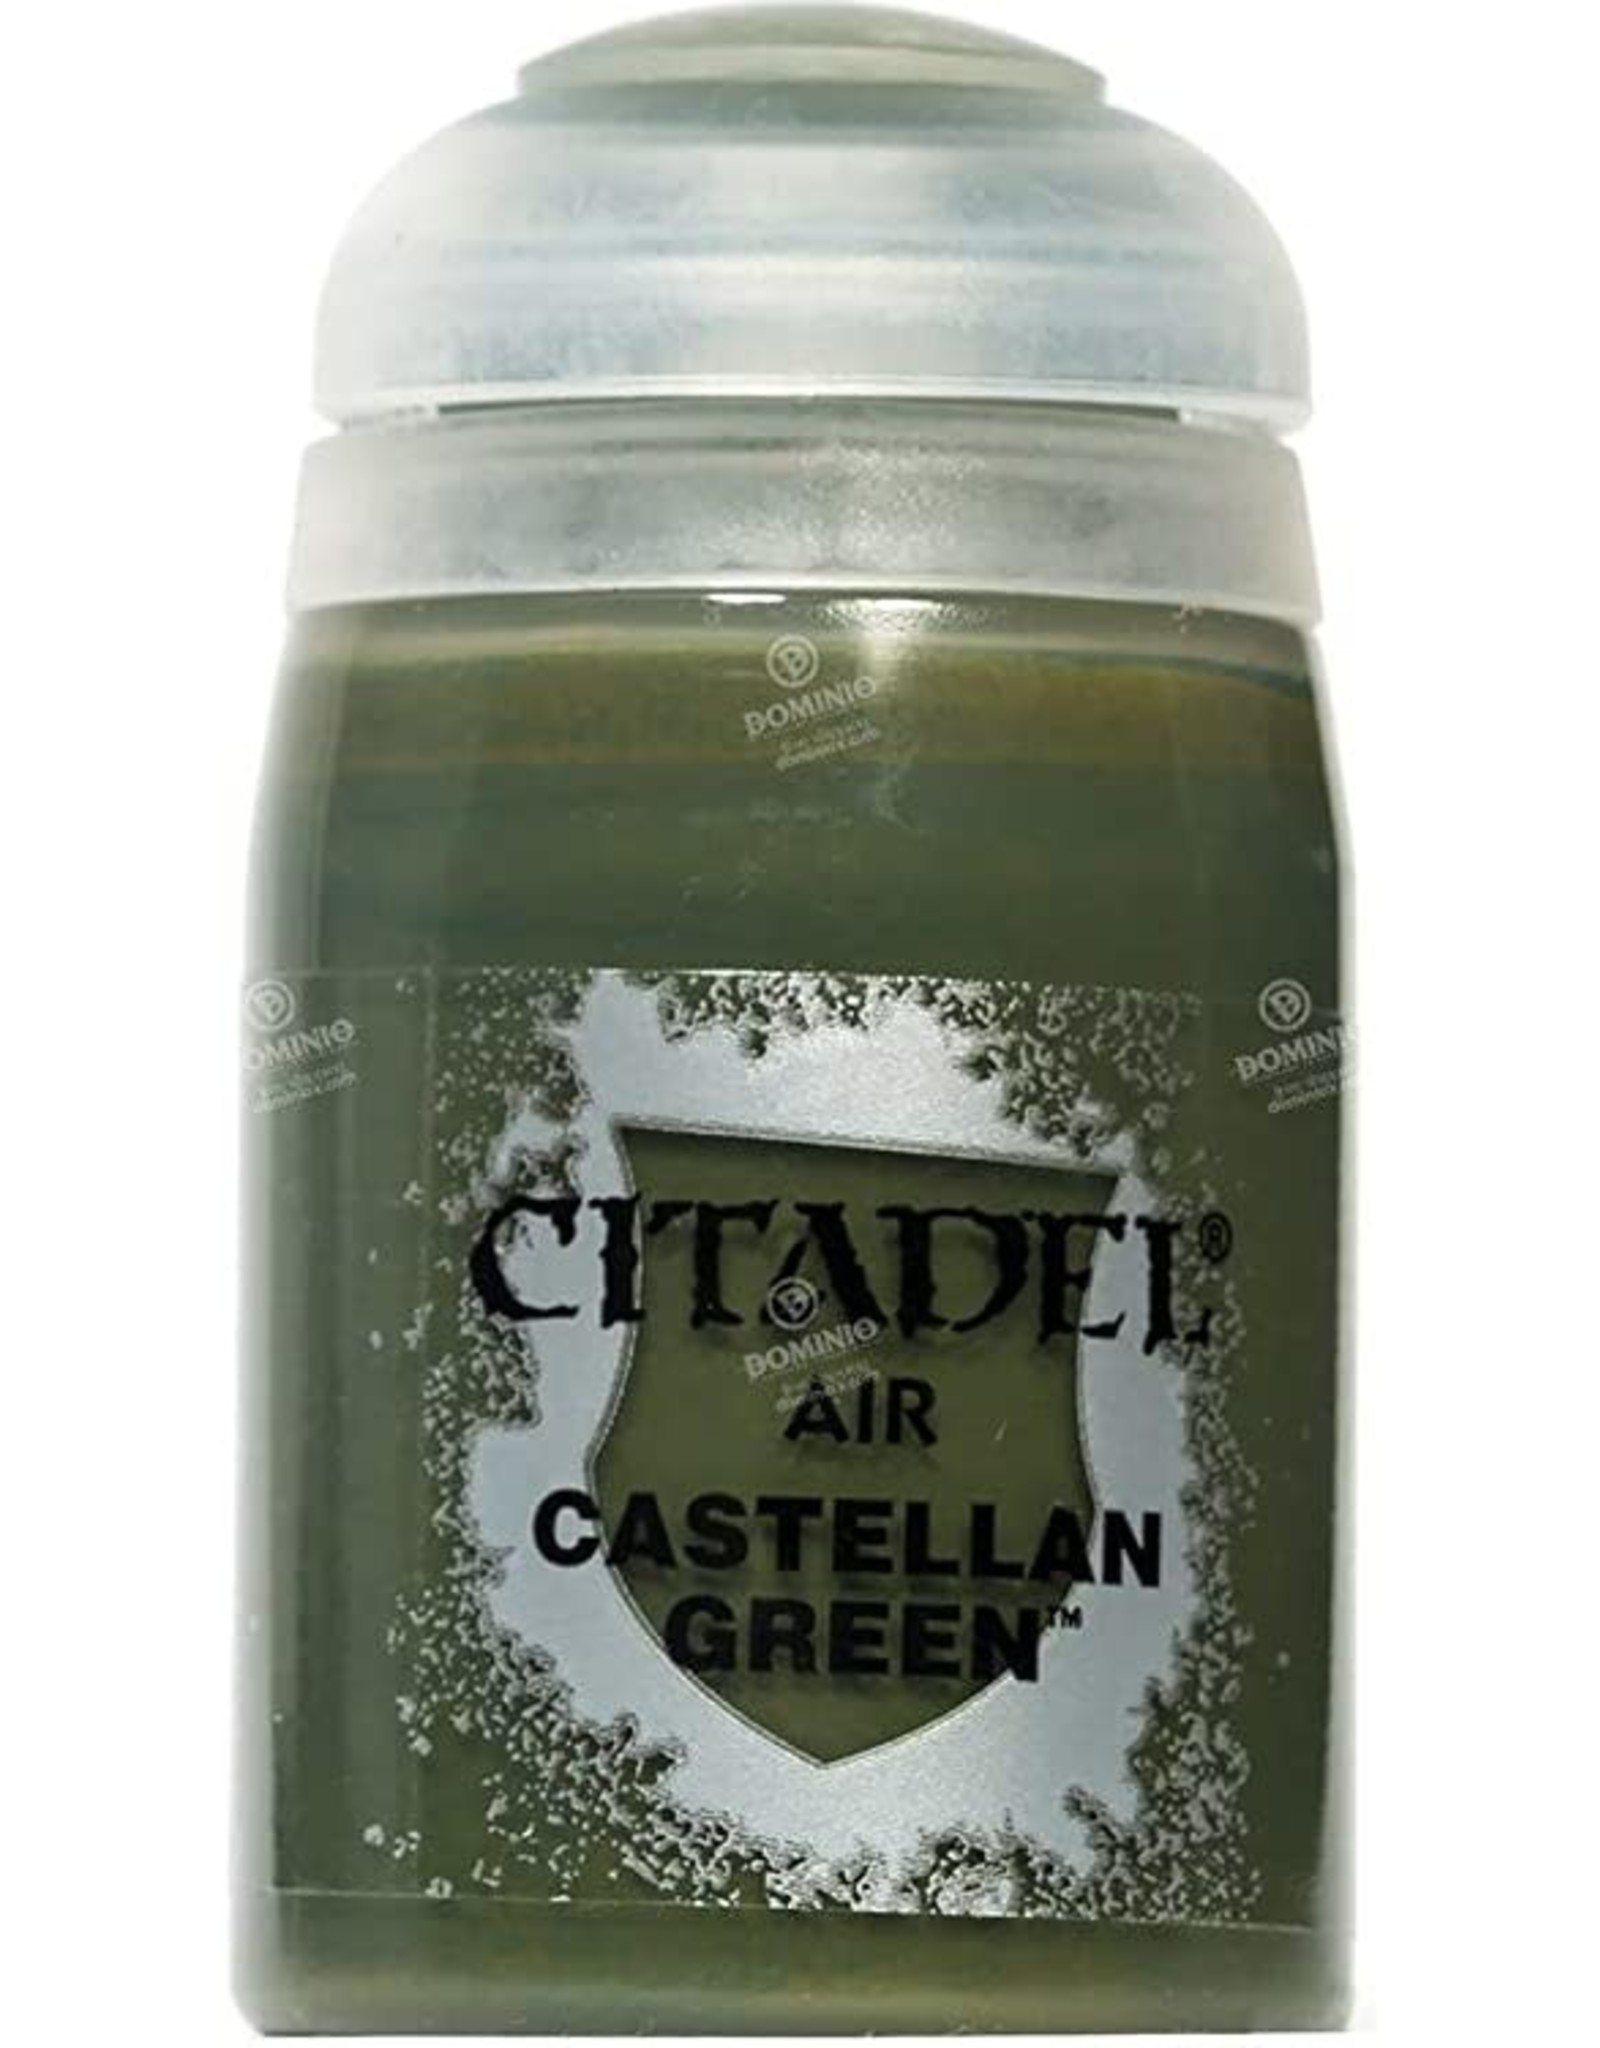 Games Workshop Citadel Paint: Castellan Green Air (24 ml)